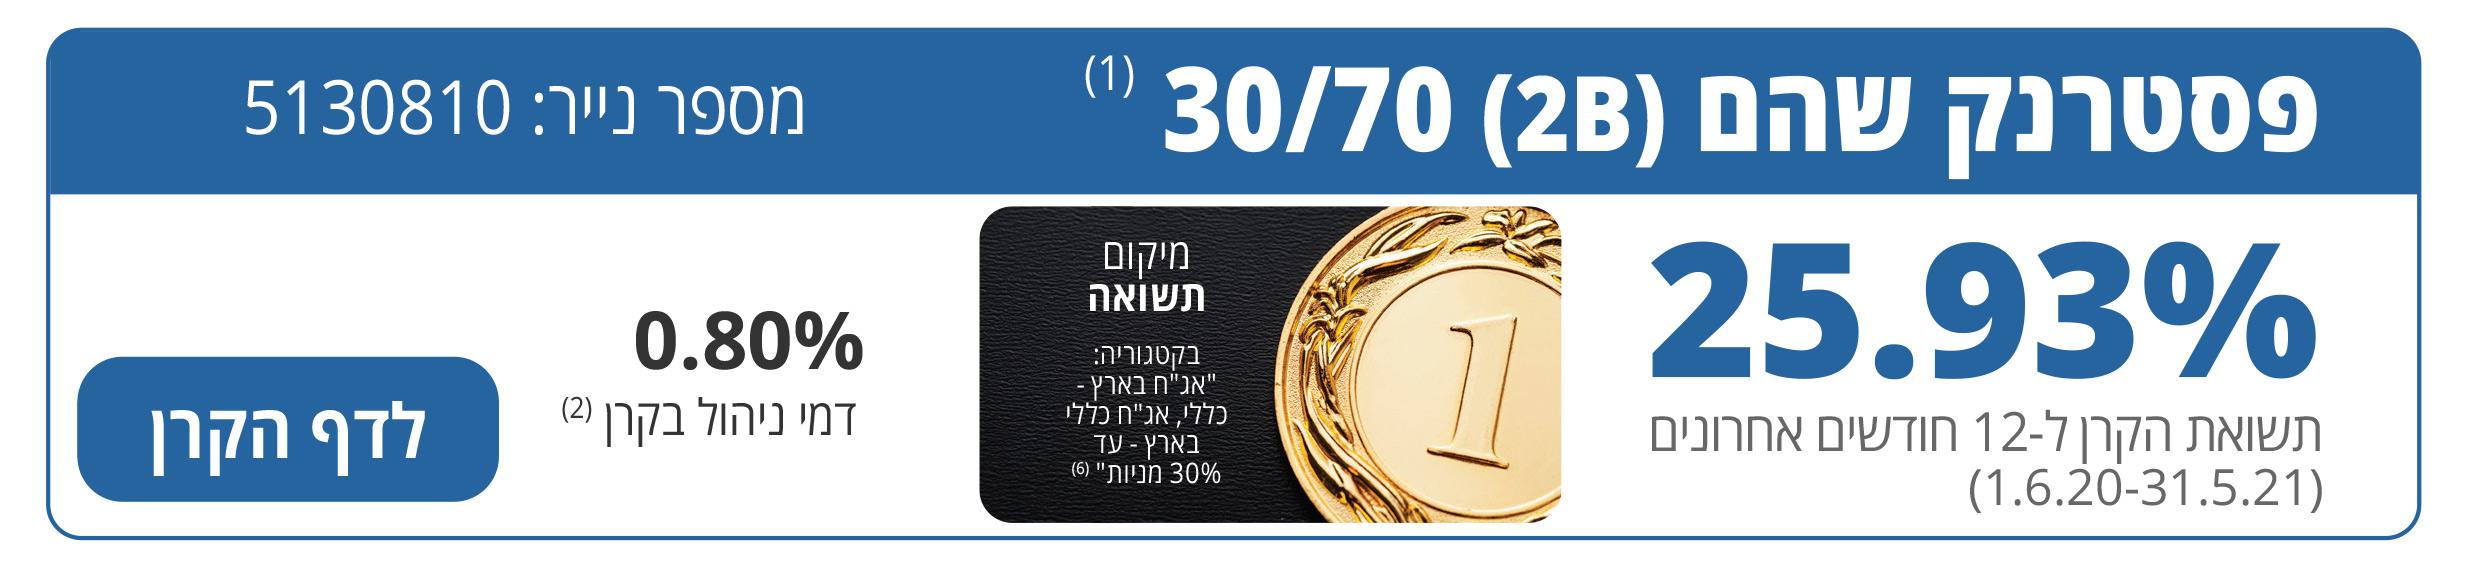 30_70-0621